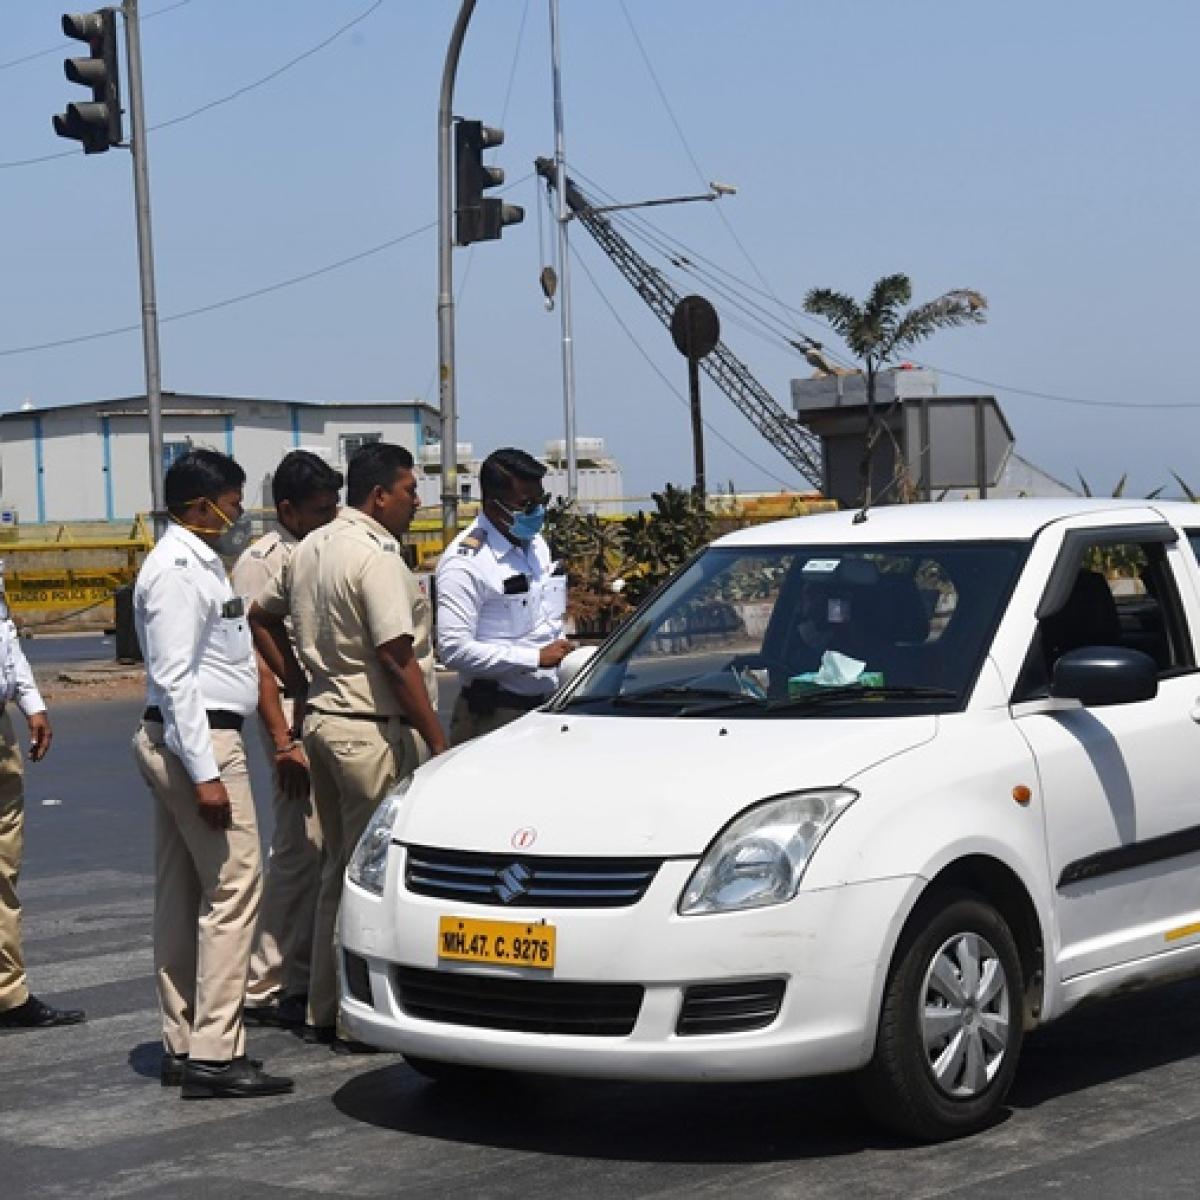 Coronavirus update: Uber limits services in several cities including Mumbai, Pune, Delhi and Kolkata